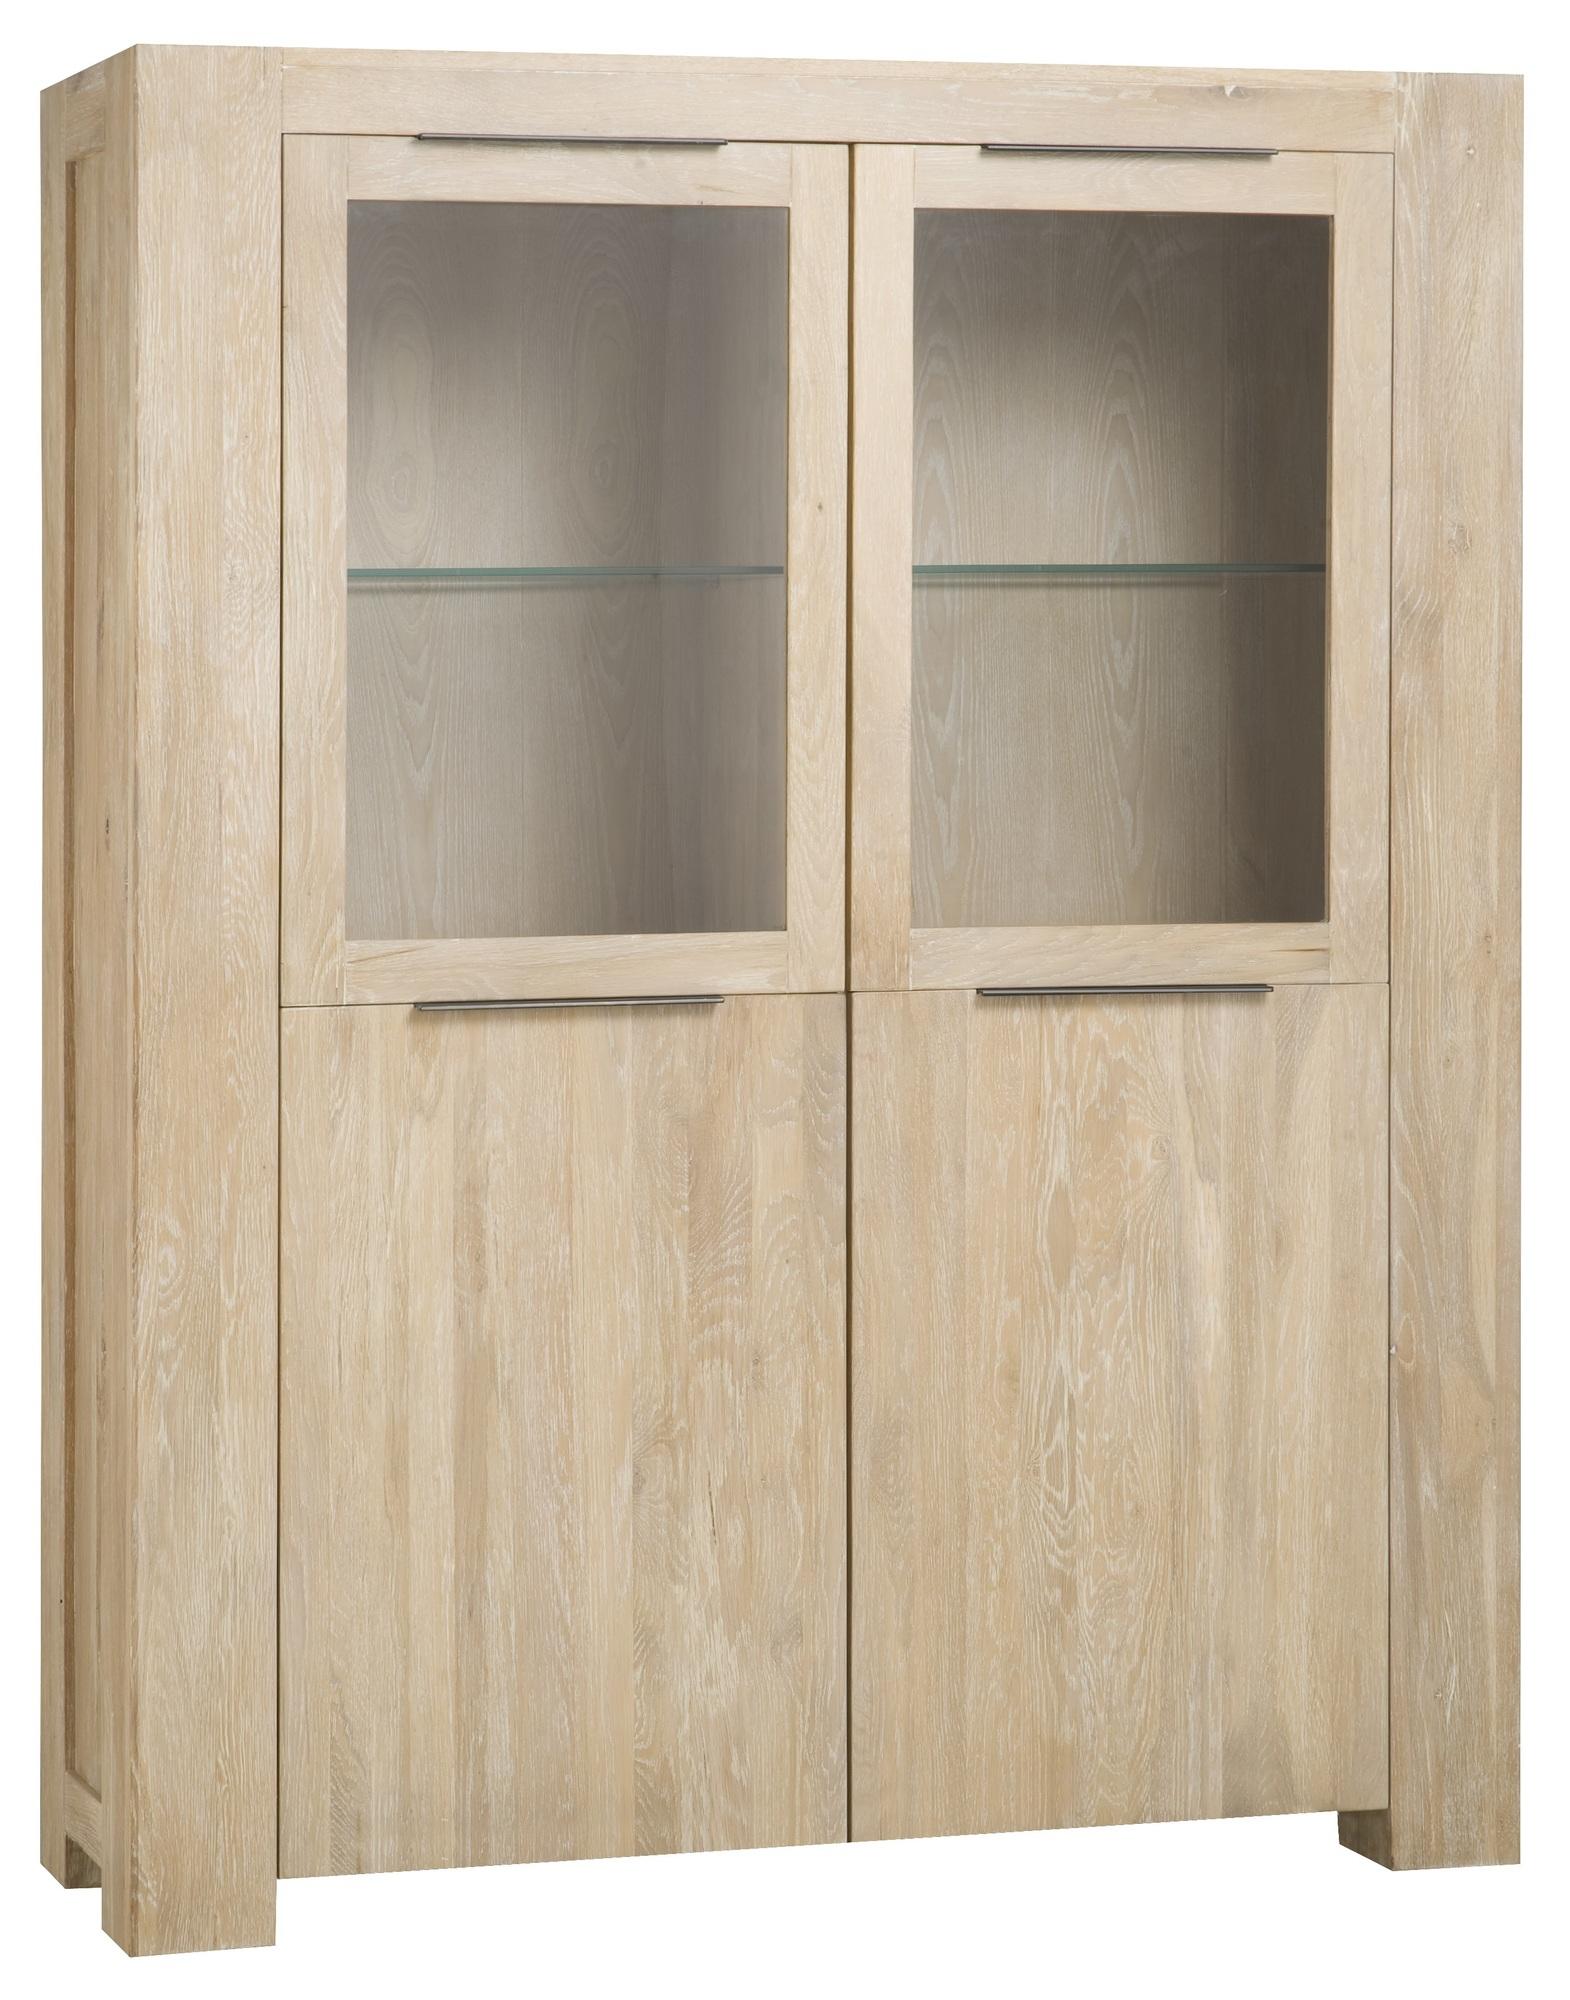 kast-luuk-vitrinekast-towerliving-BM 1012-140cm-eiken-whitewash-glazen deuren